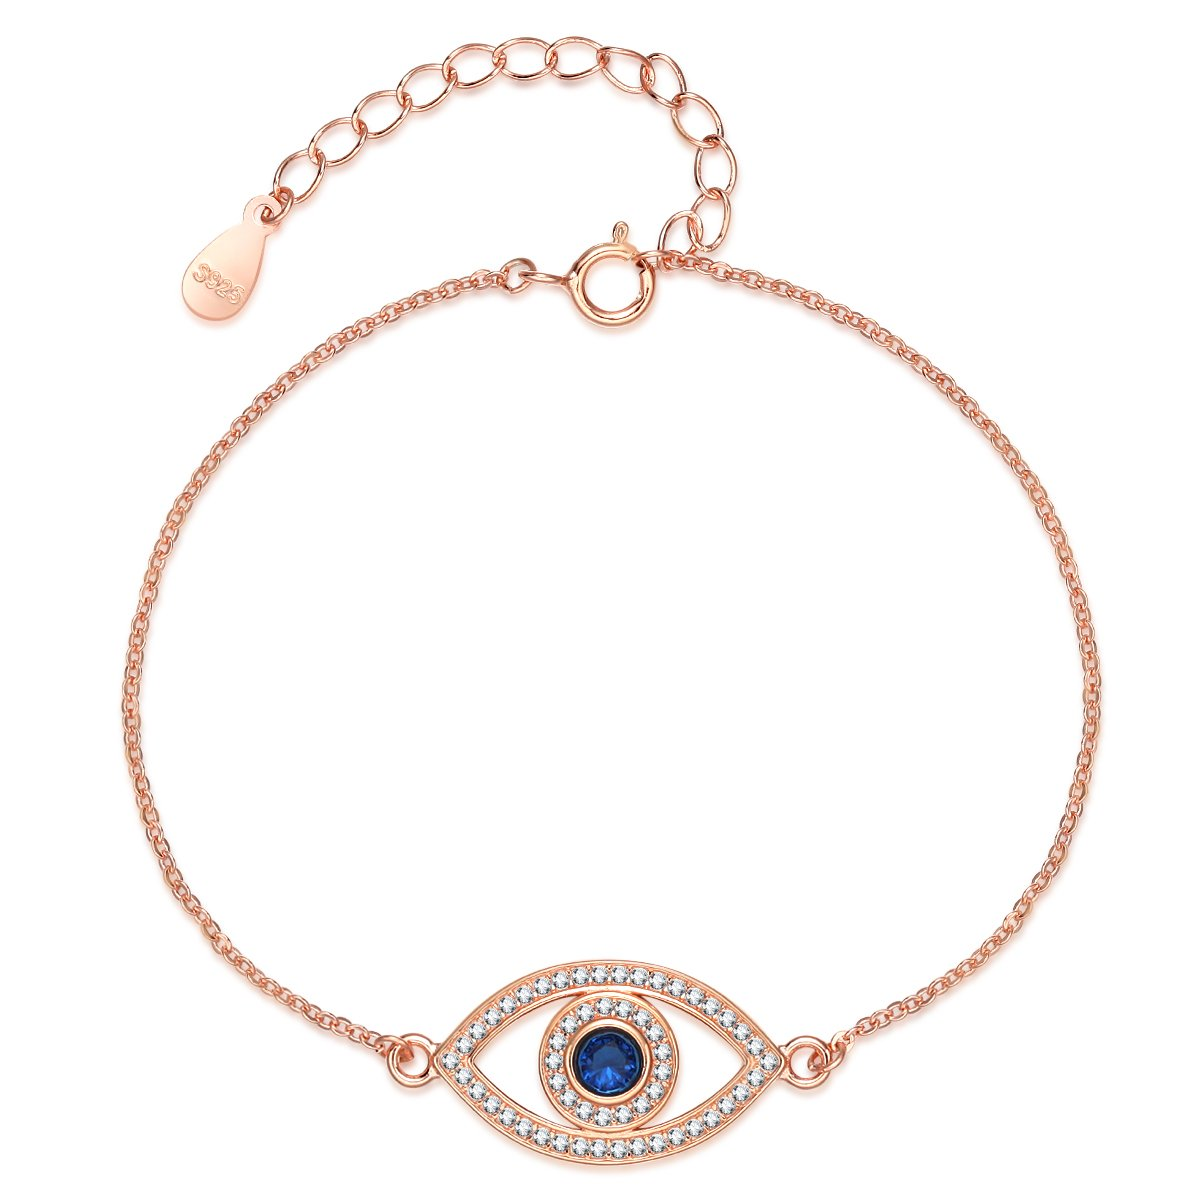 Satioter&Gasttini Sterling Silver Elegant Luckily Evil Eye Adjustable Bracelet For Women (Rose Gold)